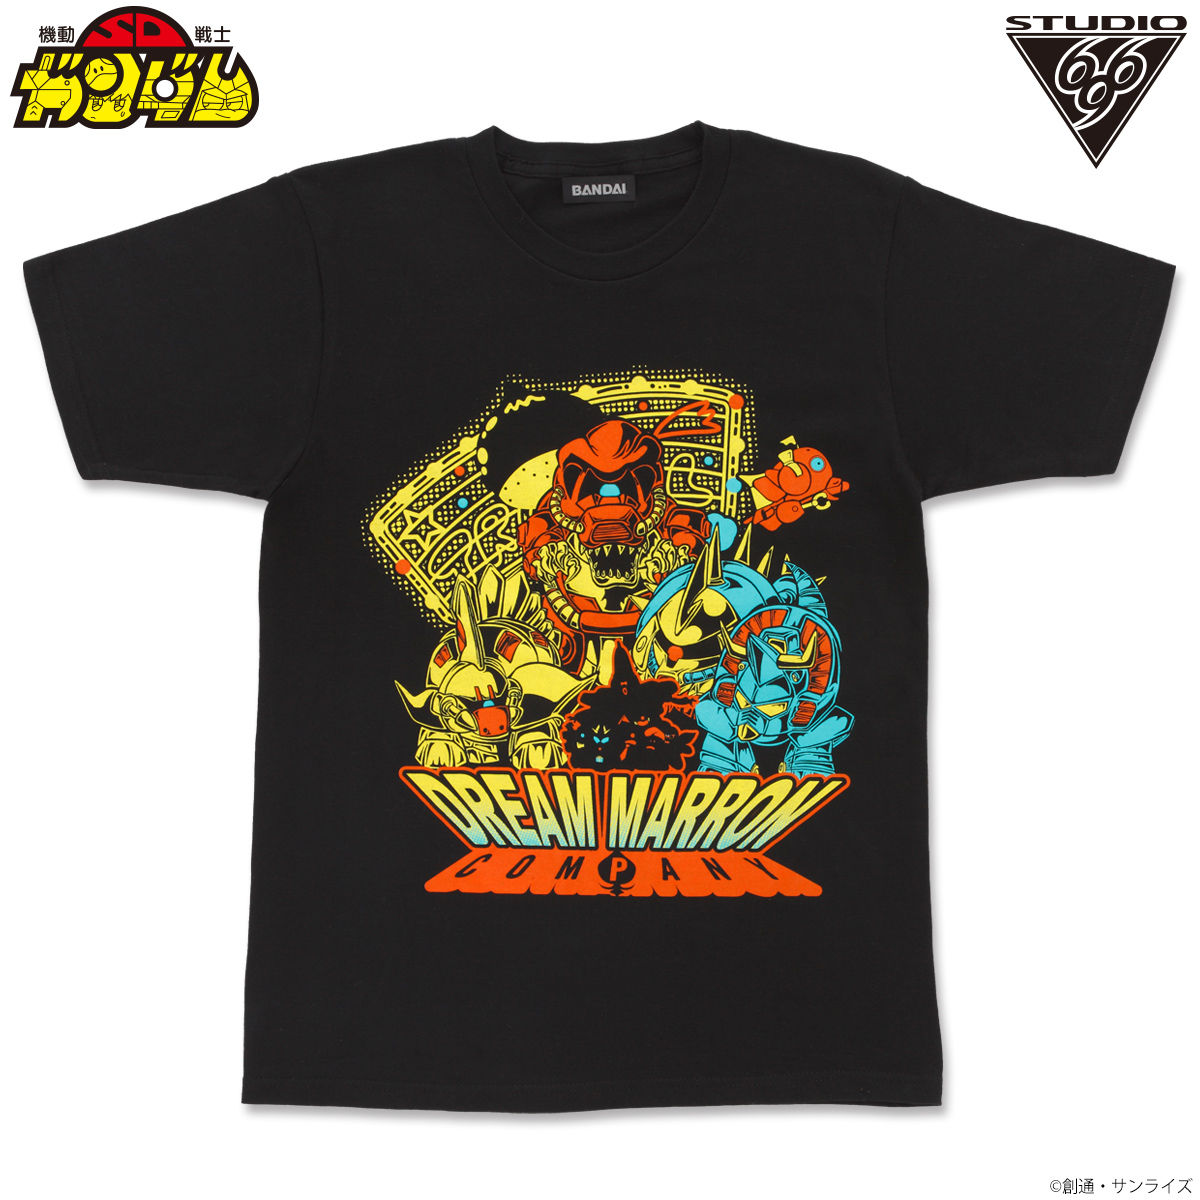 Dream Marron Company feat. STUDIO696 T-shirt